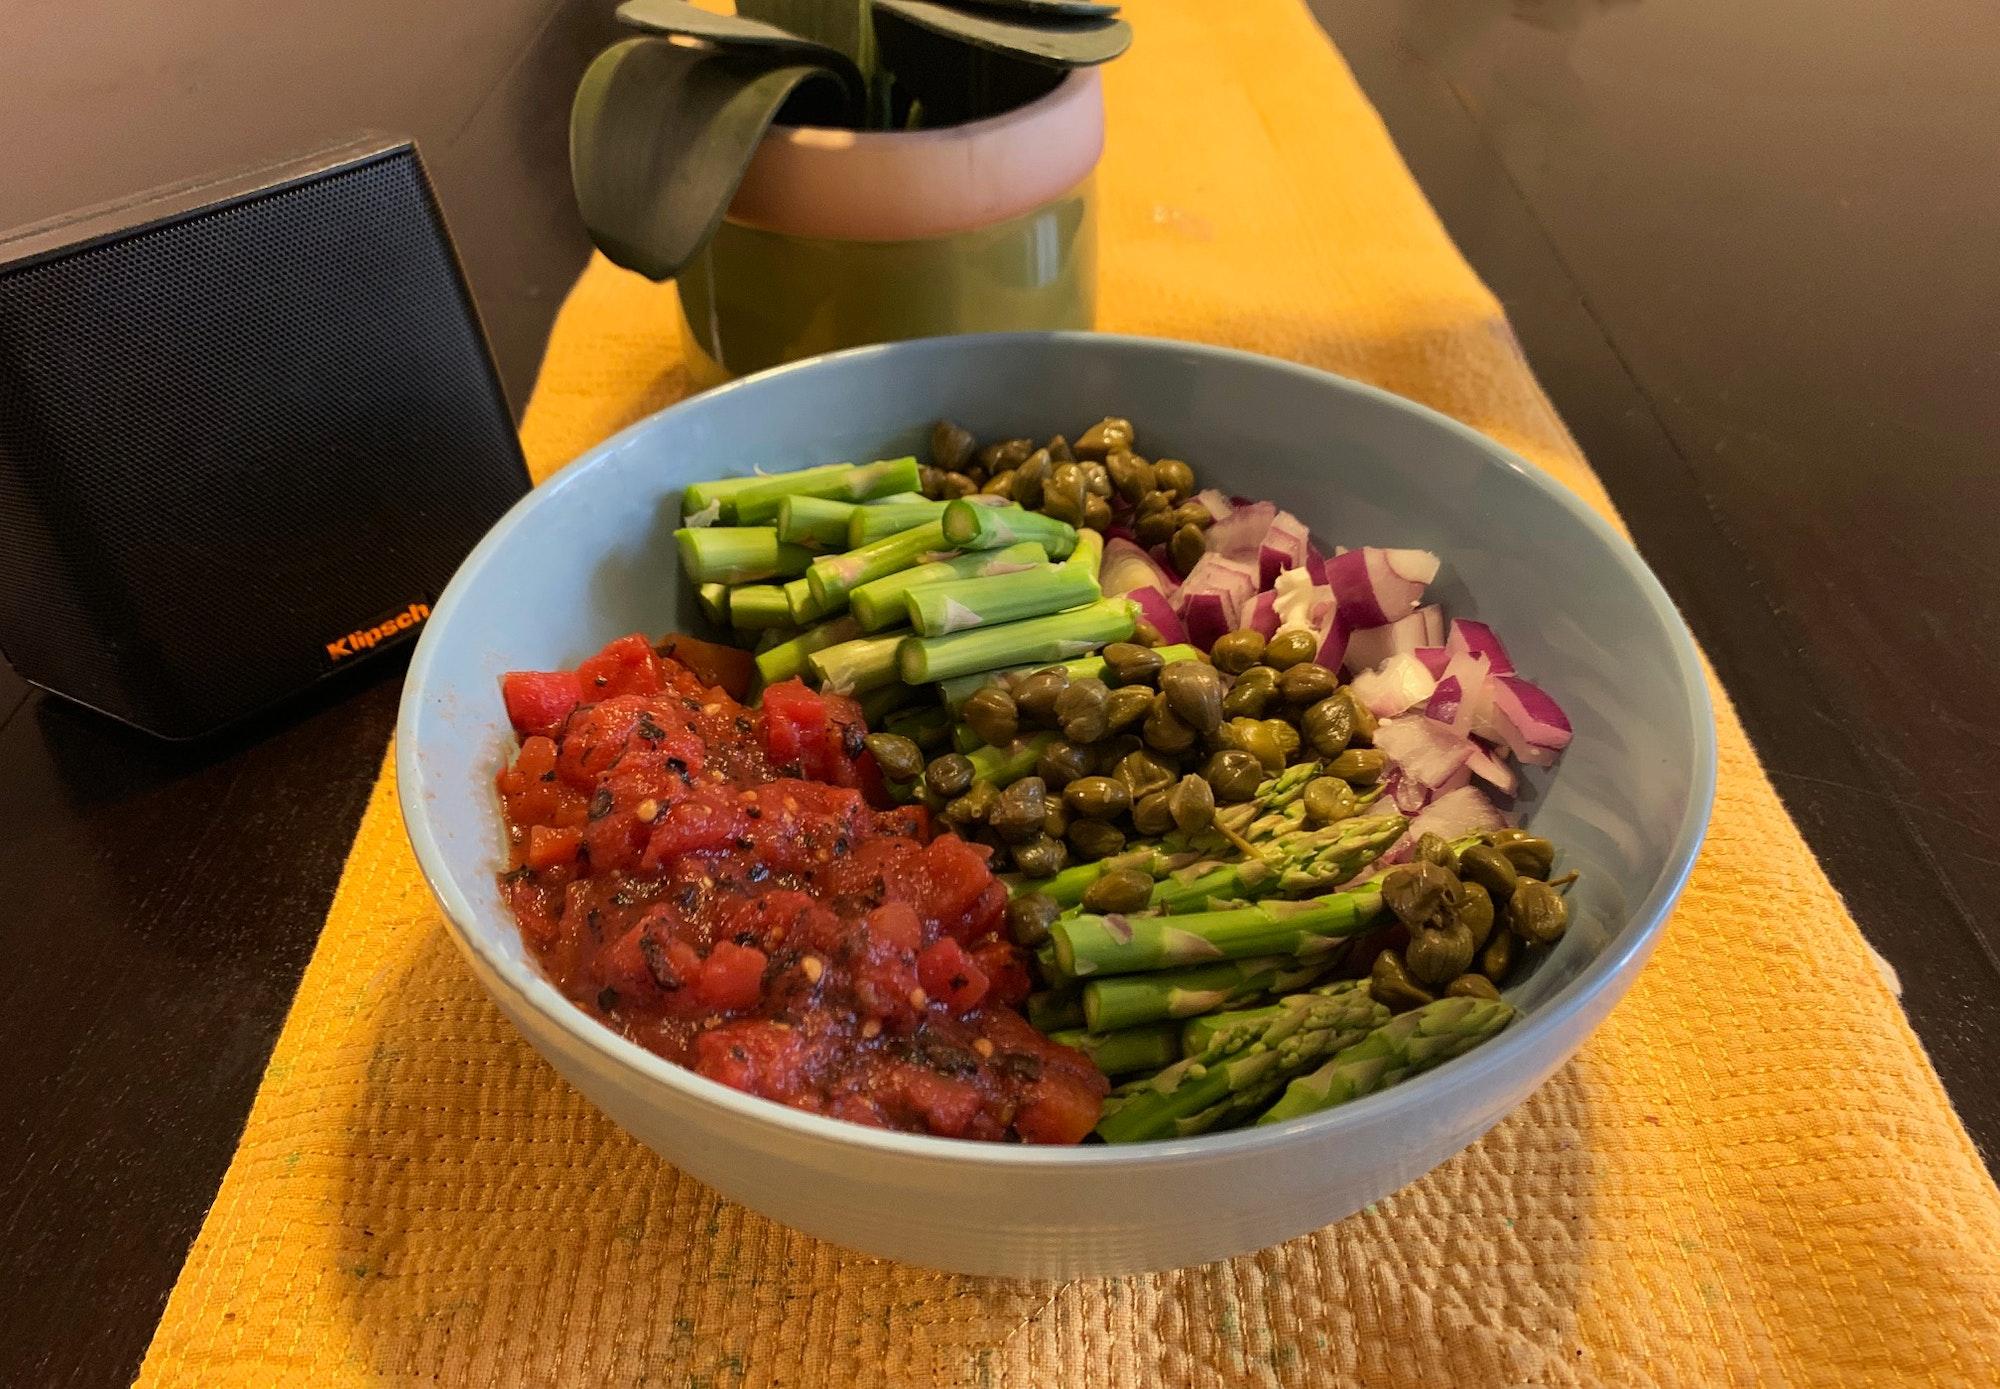 Uncooked veggies table view